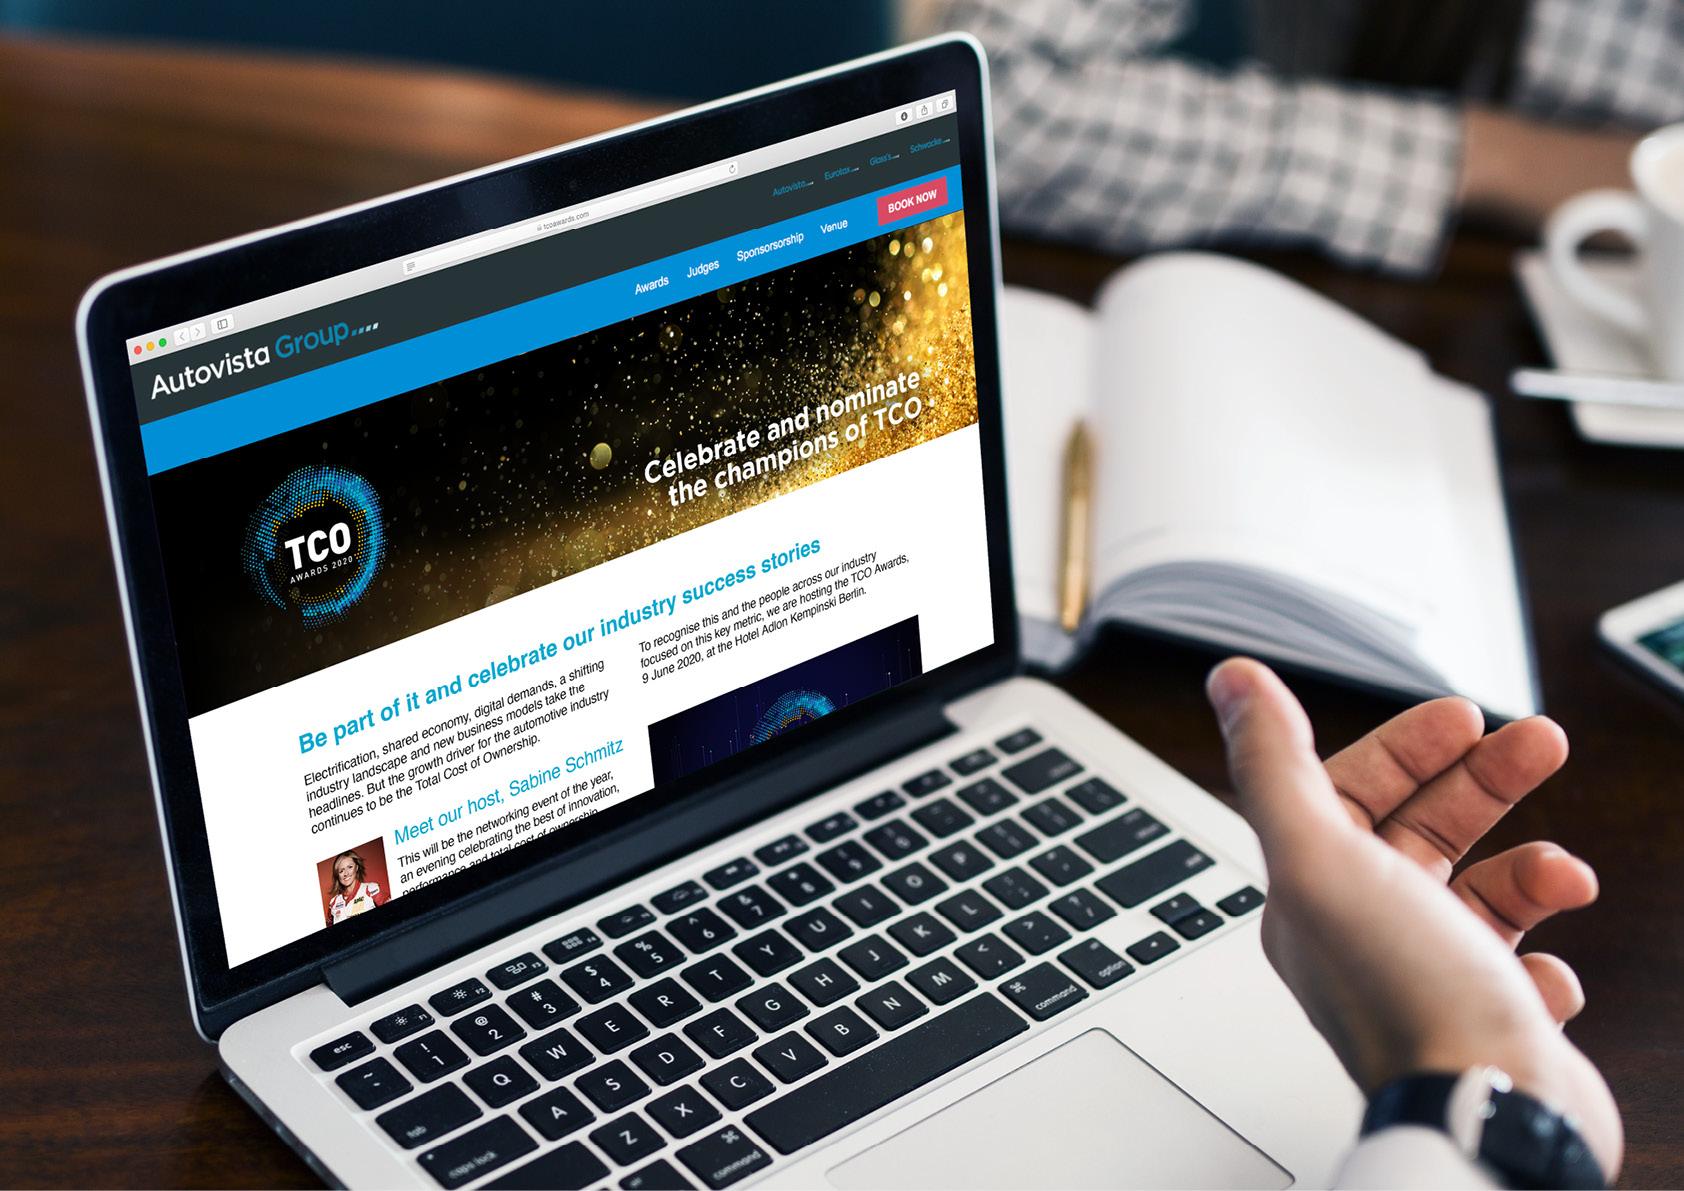 Autovista-Group–TCO-Awards–Website-in-use-2